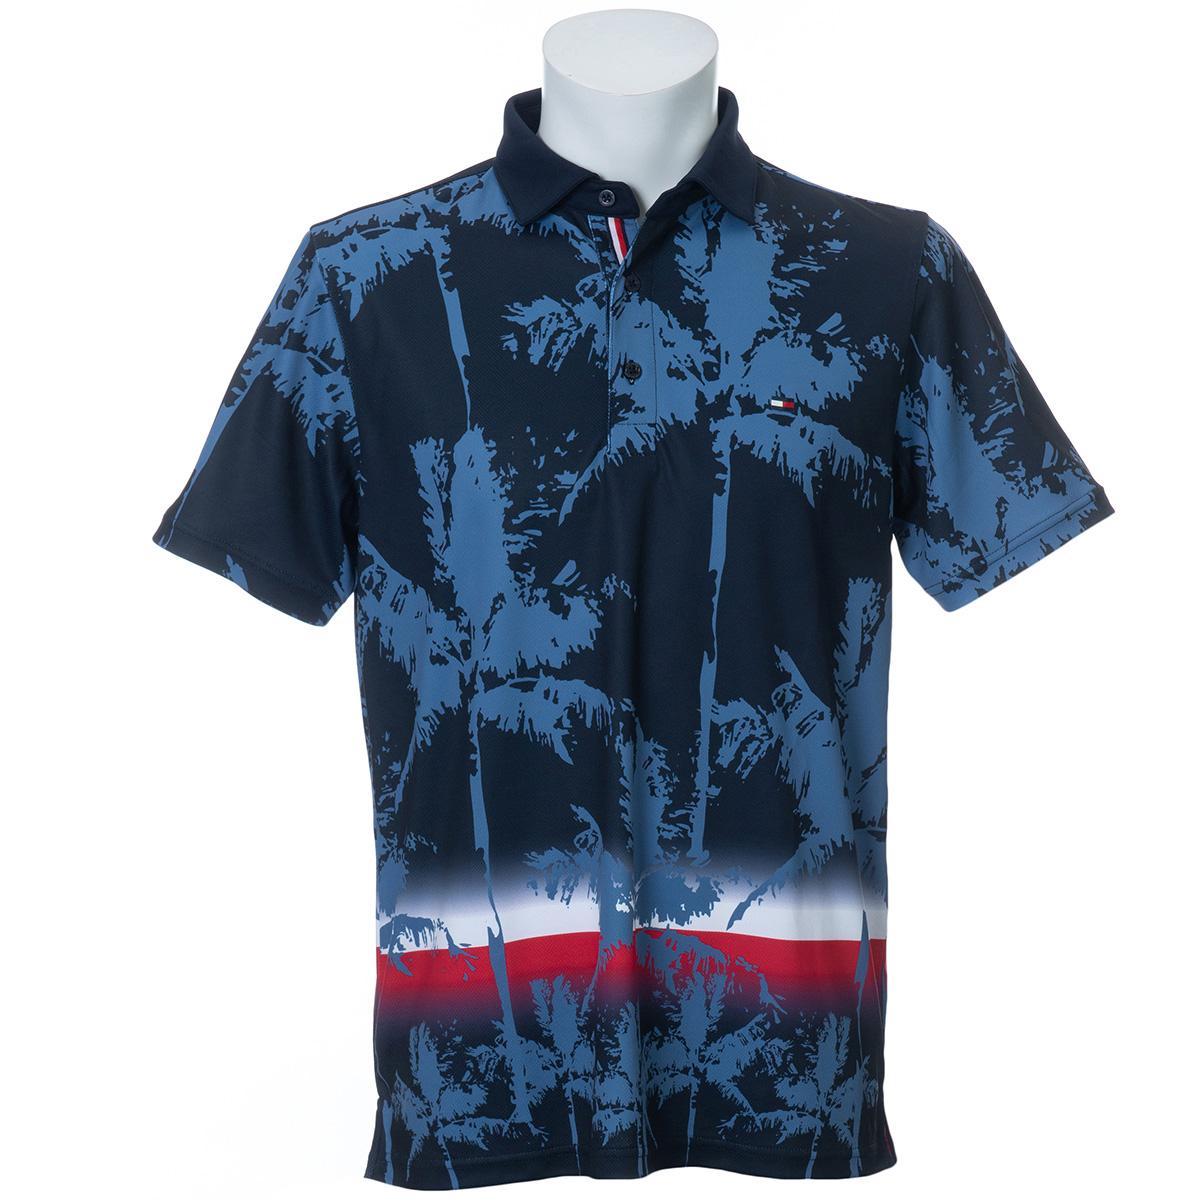 PALM TREE プリント 半袖ポロシャツ